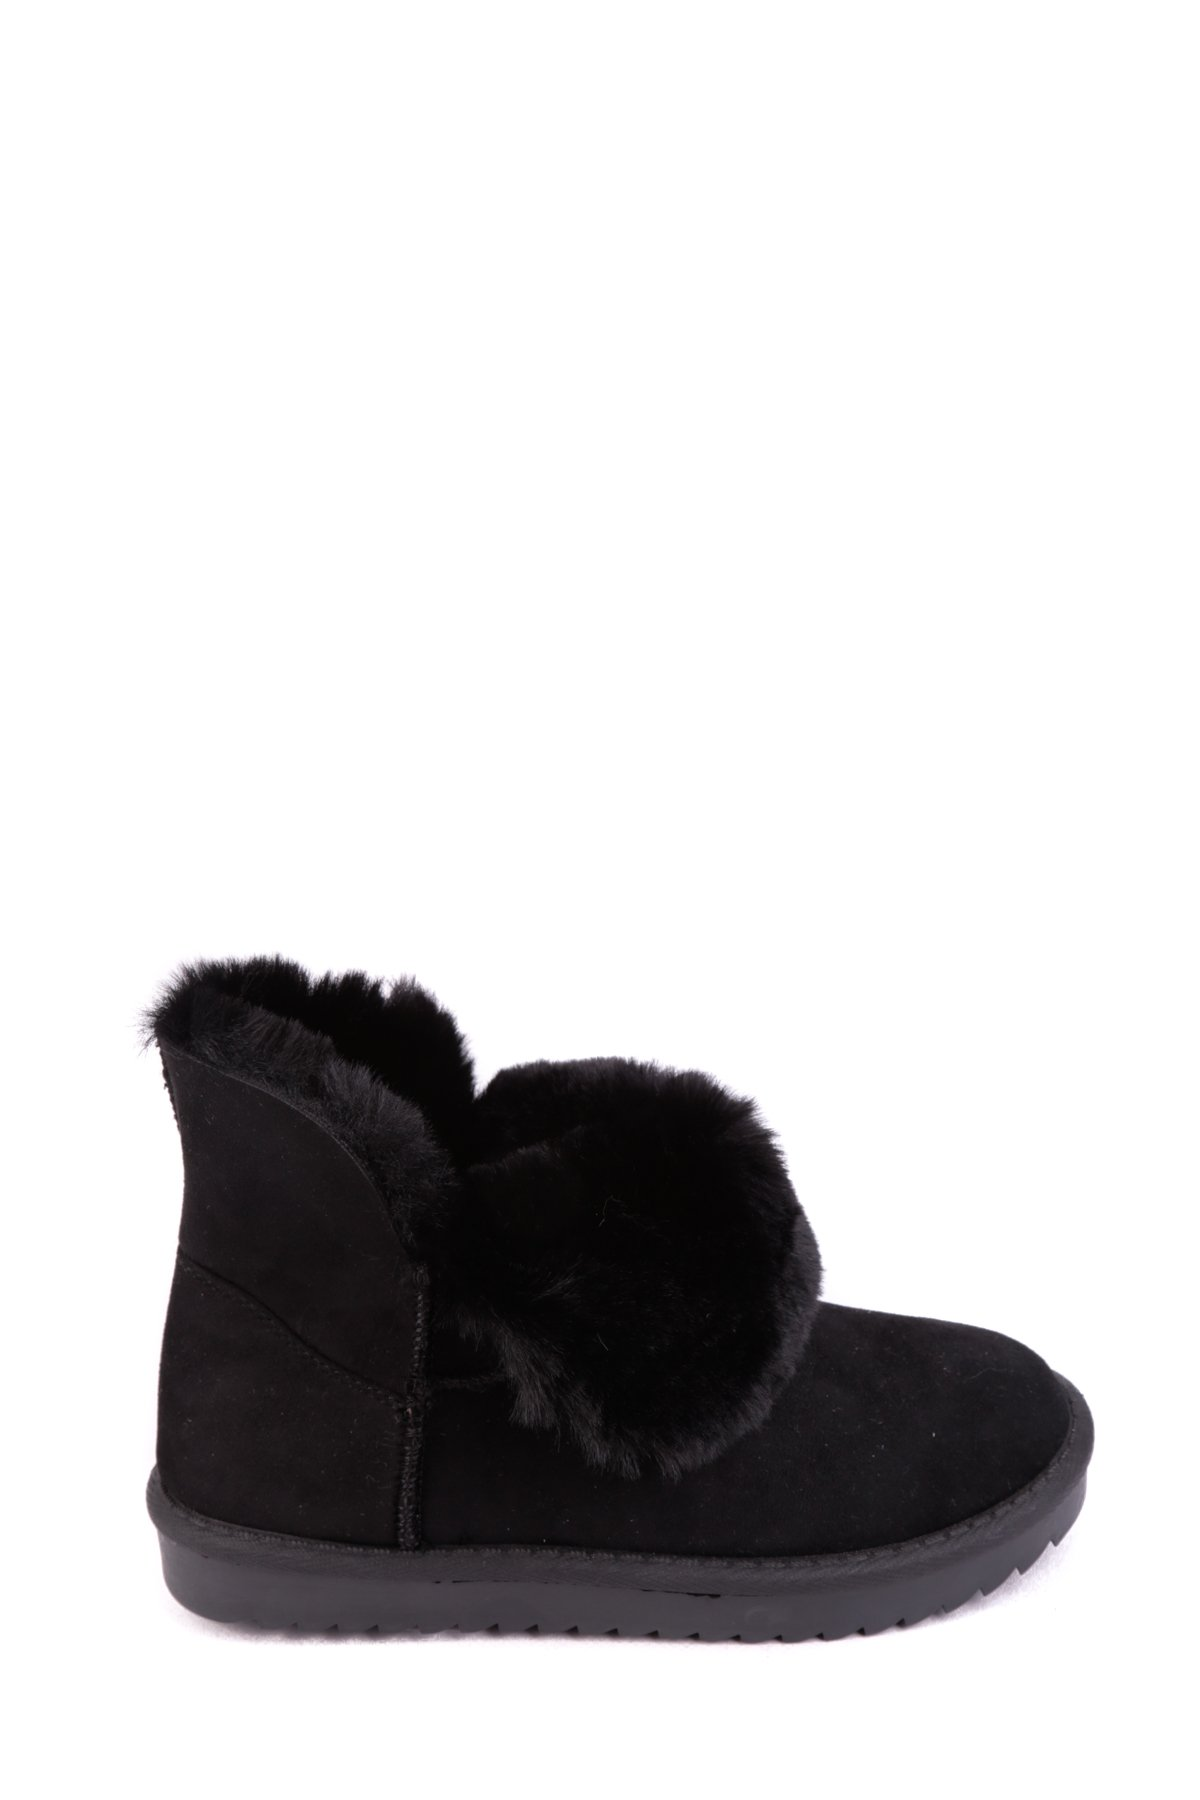 Teddy Boots